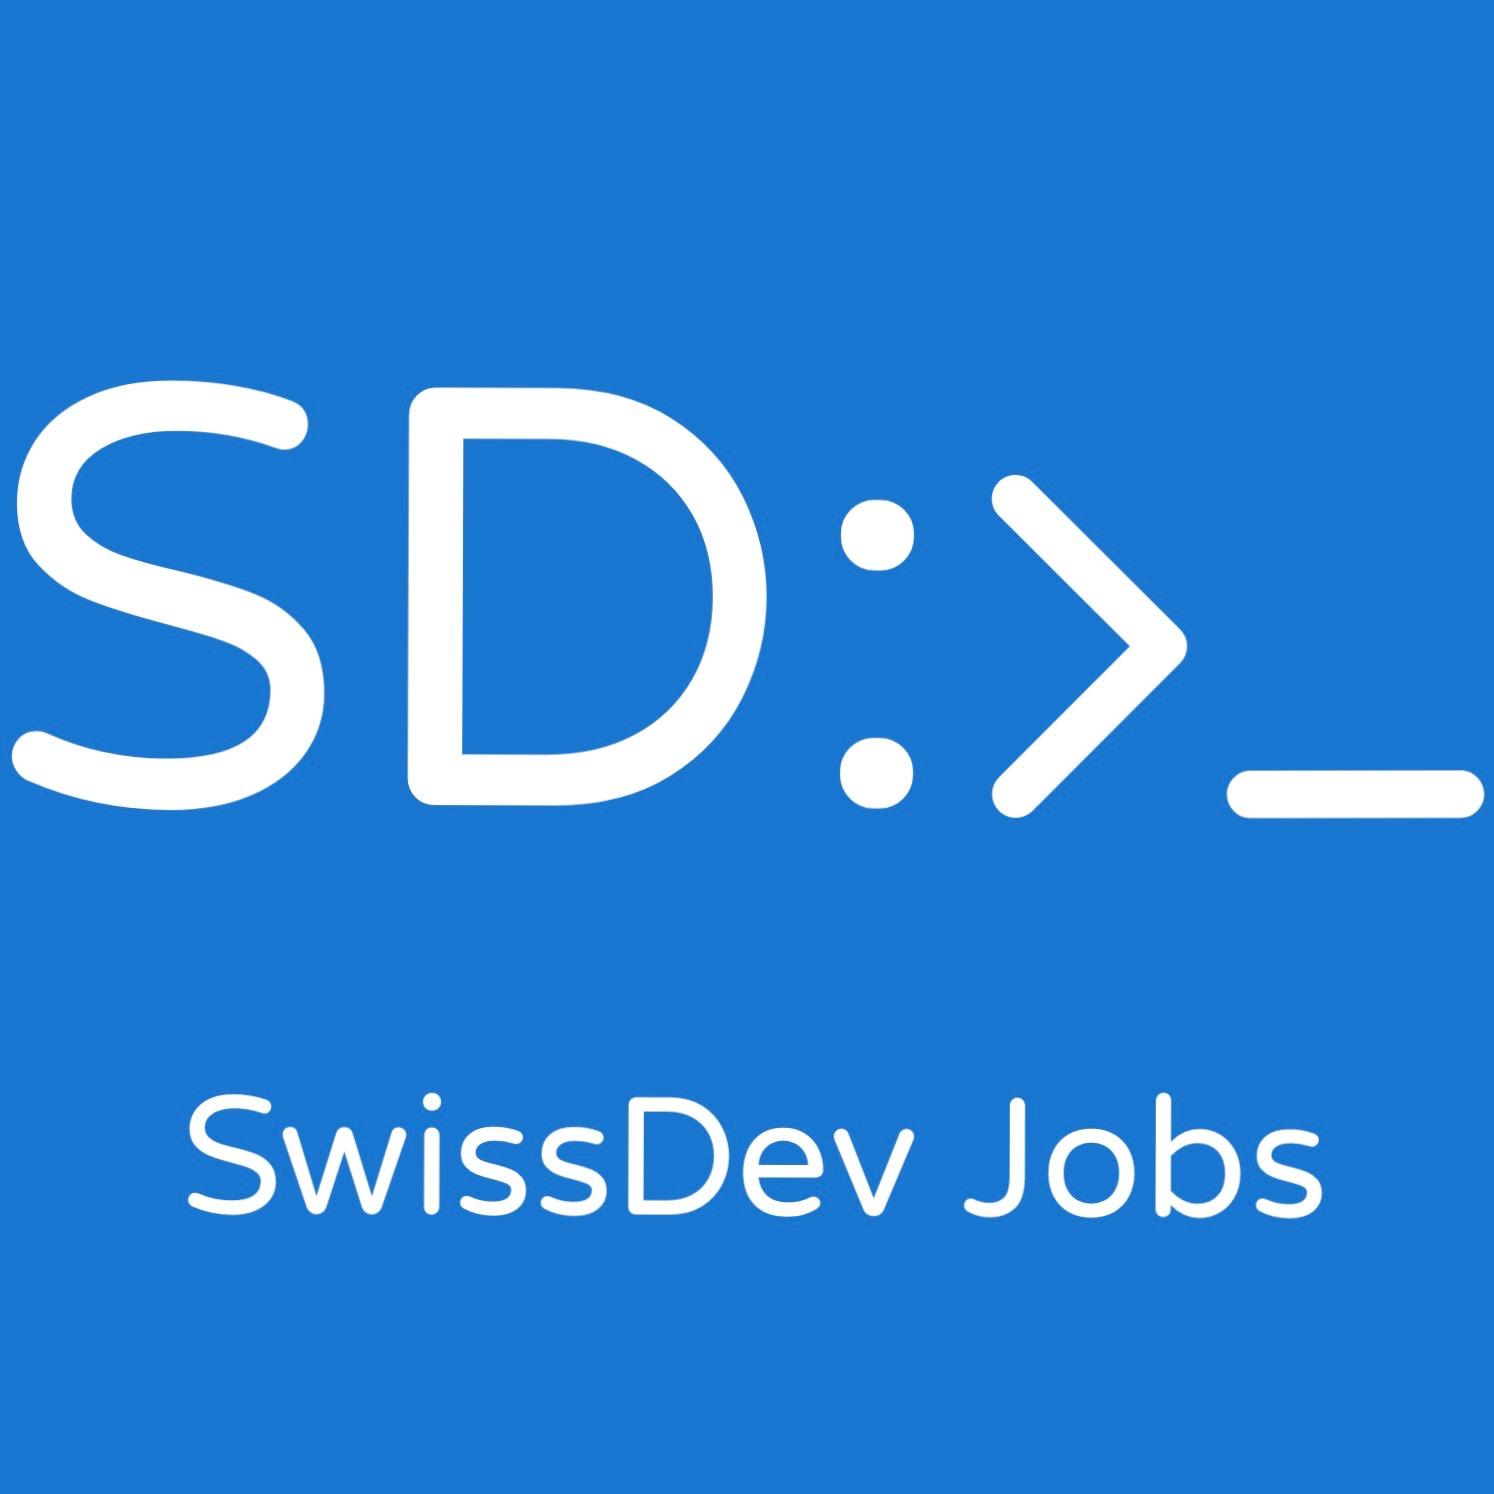 Swiss Developer Jobs